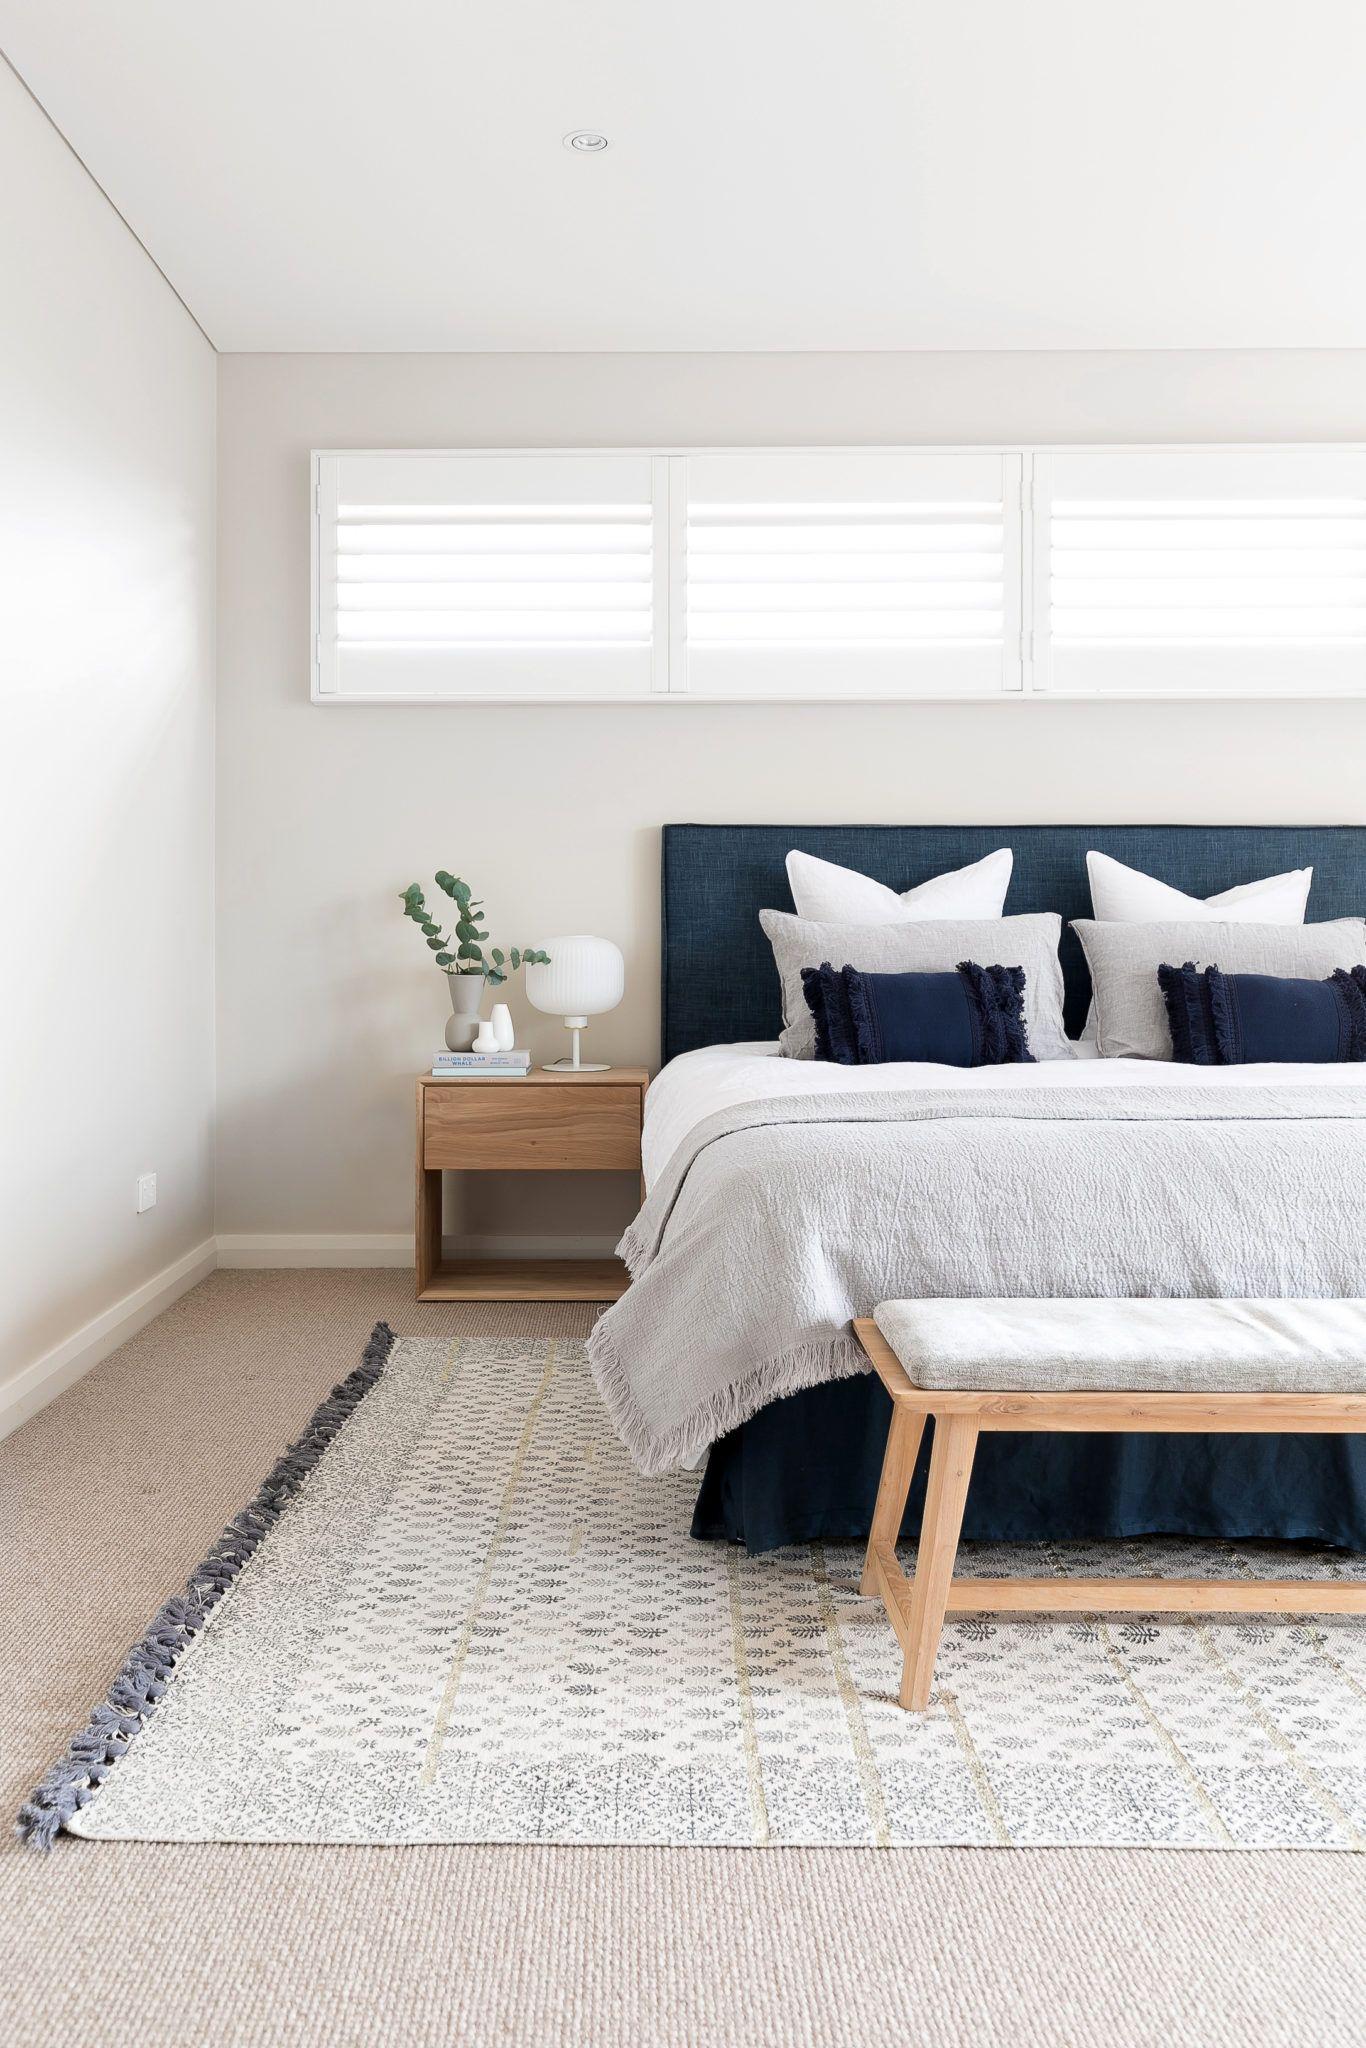 Northbridge Family Home - Studio 1 Interiors